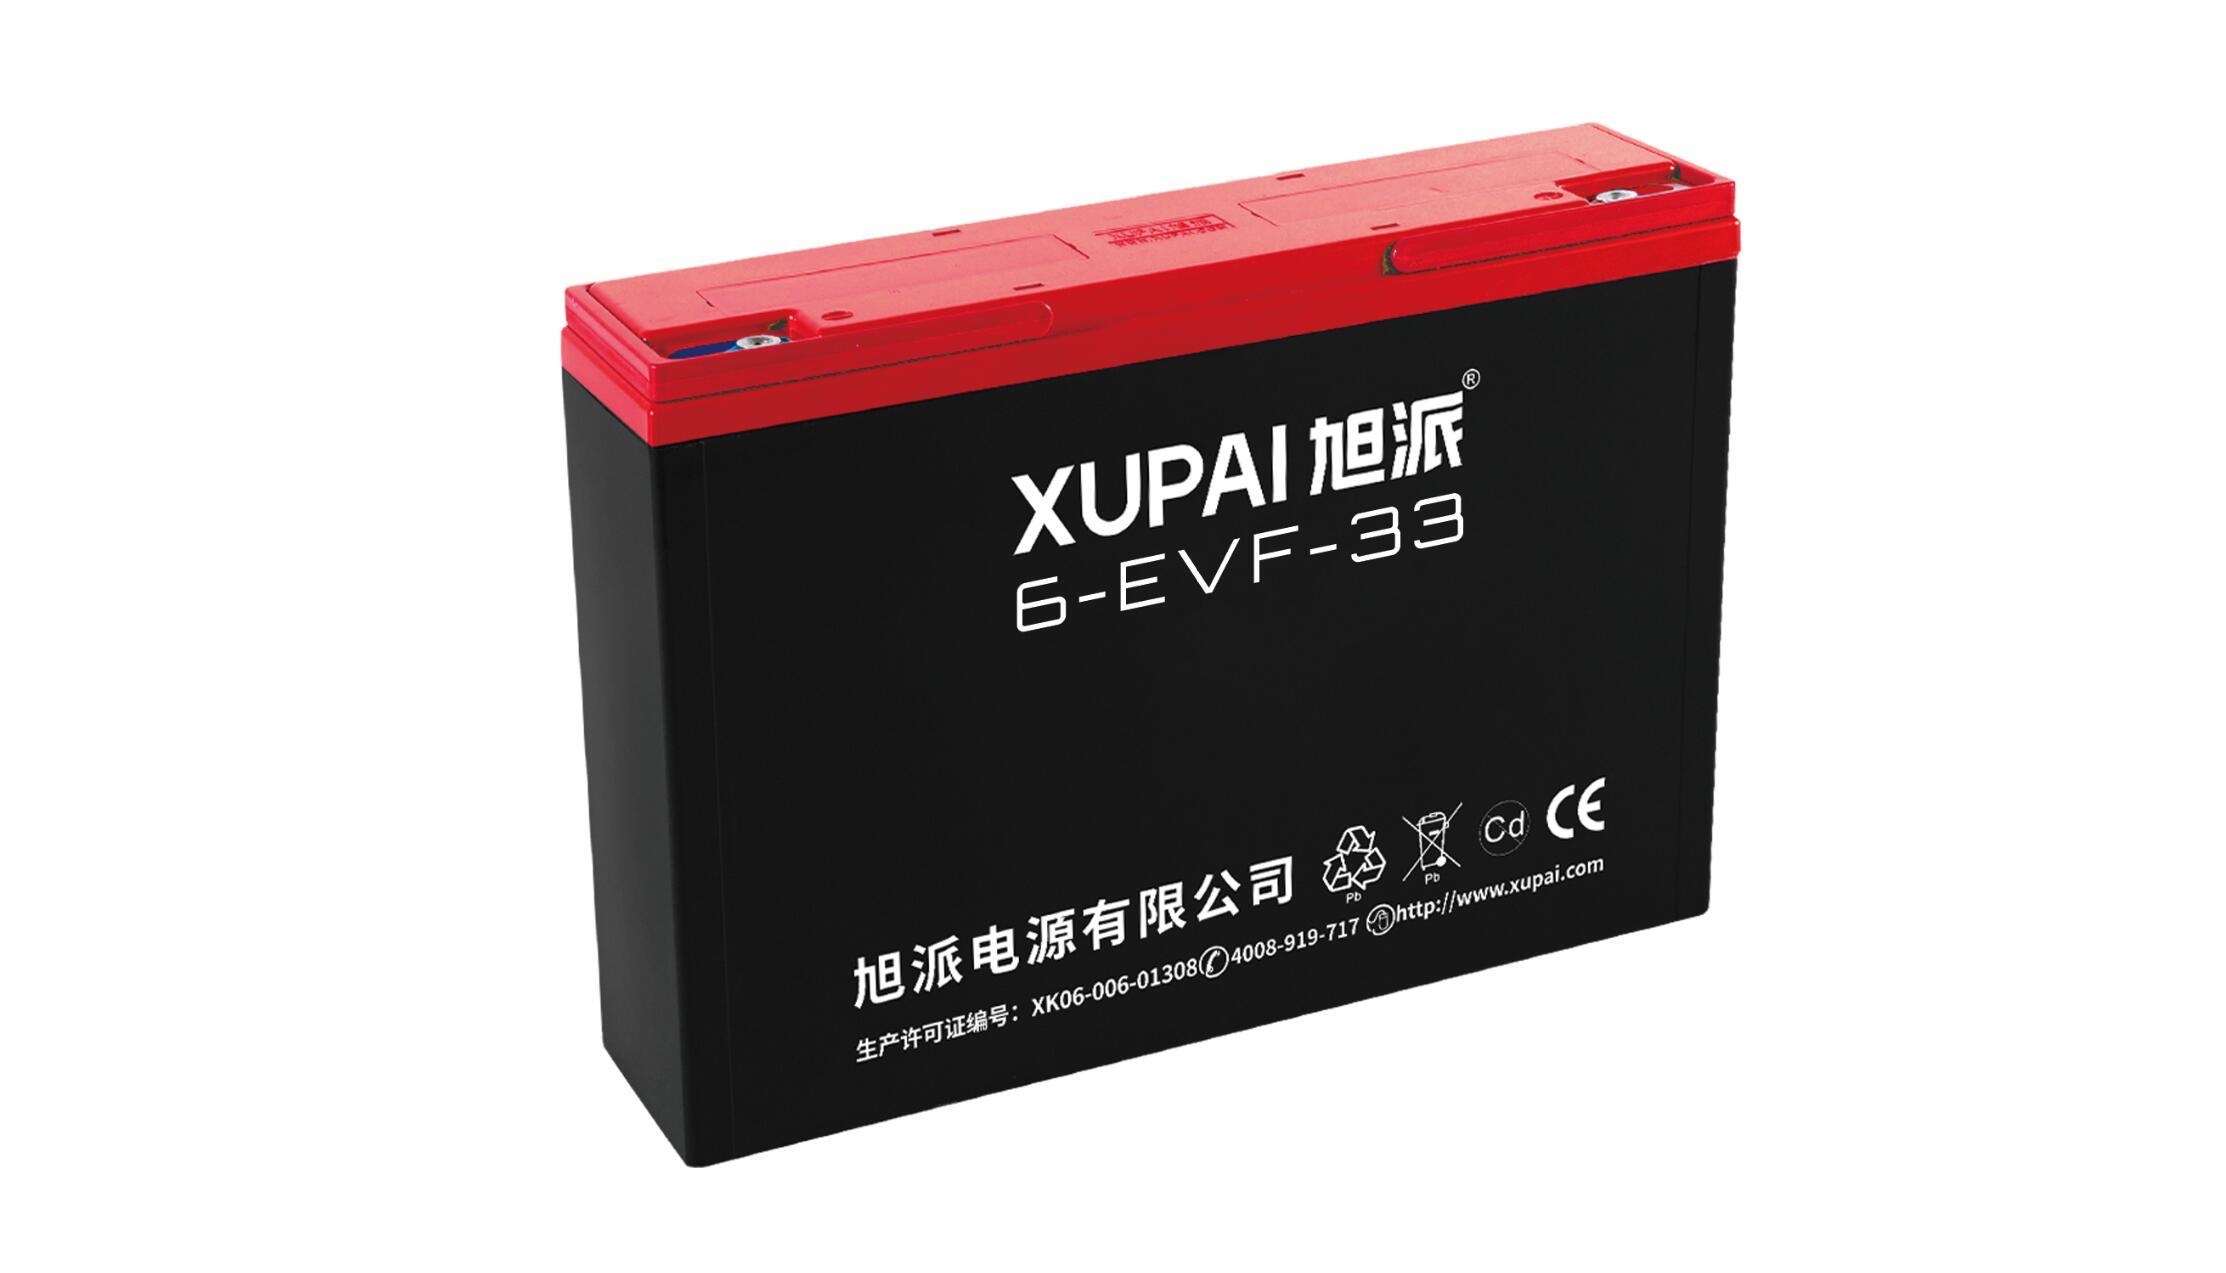 6-EVF-33铂金电池